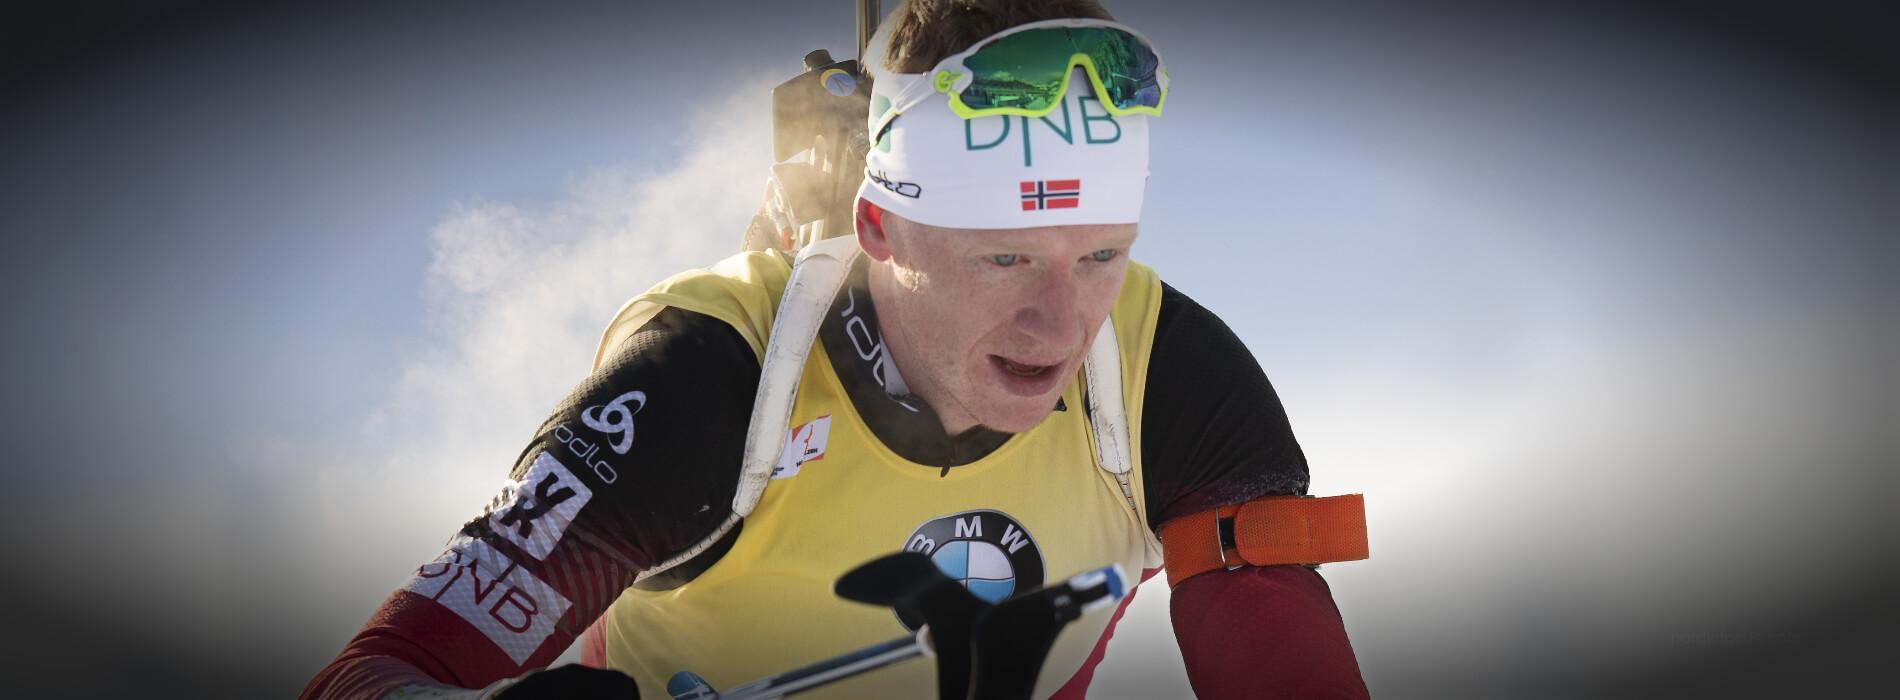 Johannes Thingnes Boe Nove Mesto Sprint 2018